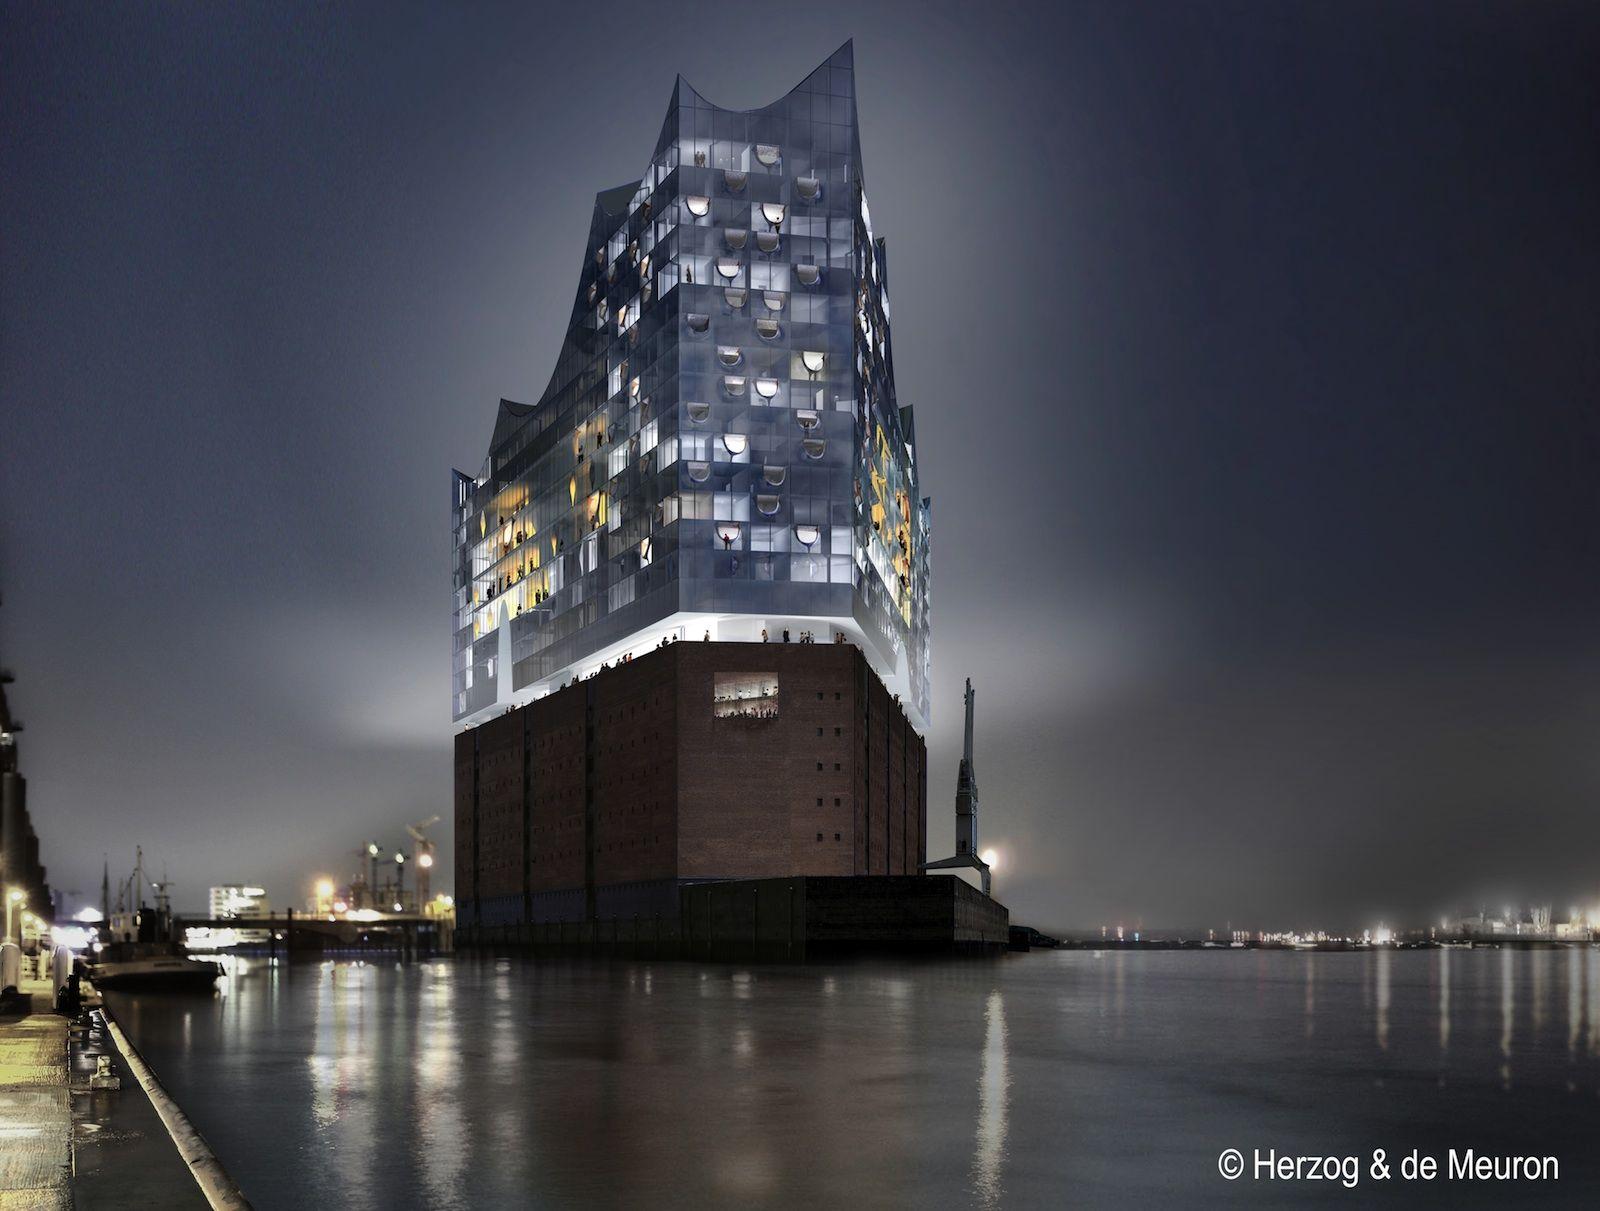 Architecture Tour Hamburg Guiding Architects Concert Hall Hamburg Elbphilharmonie Hamburg